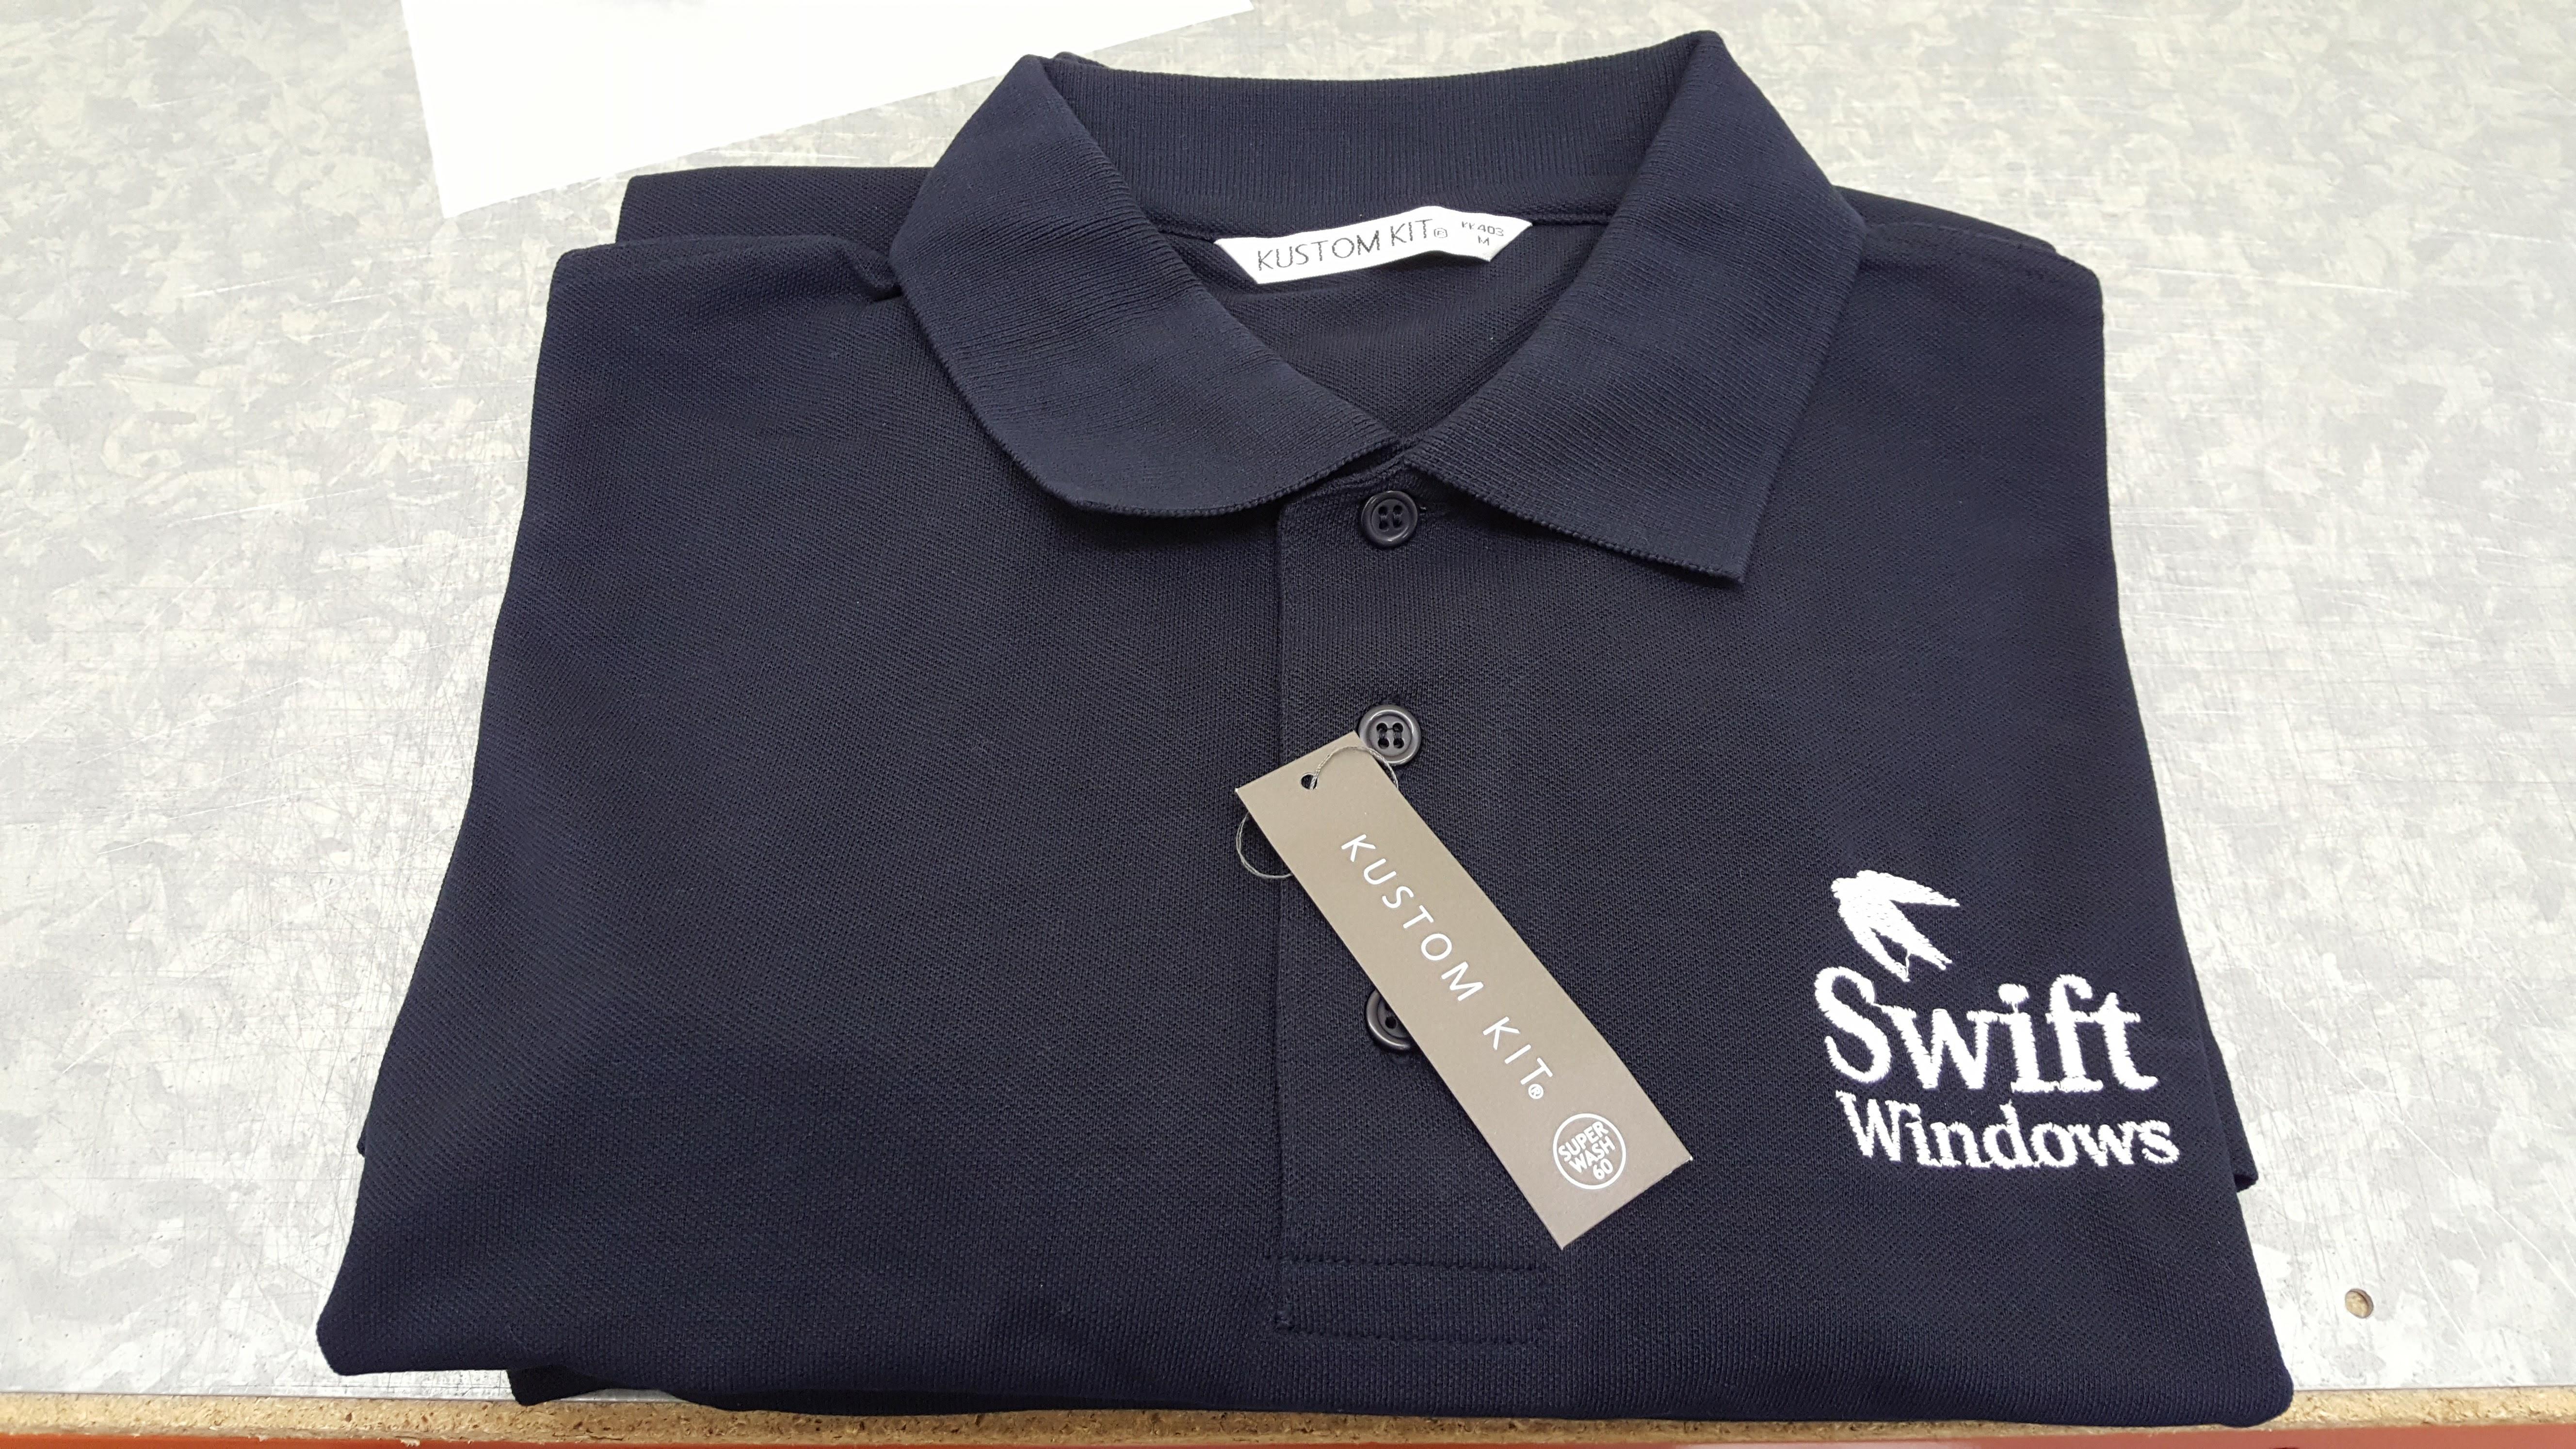 521cb952f05b Custom Embroidered Shirts Uk